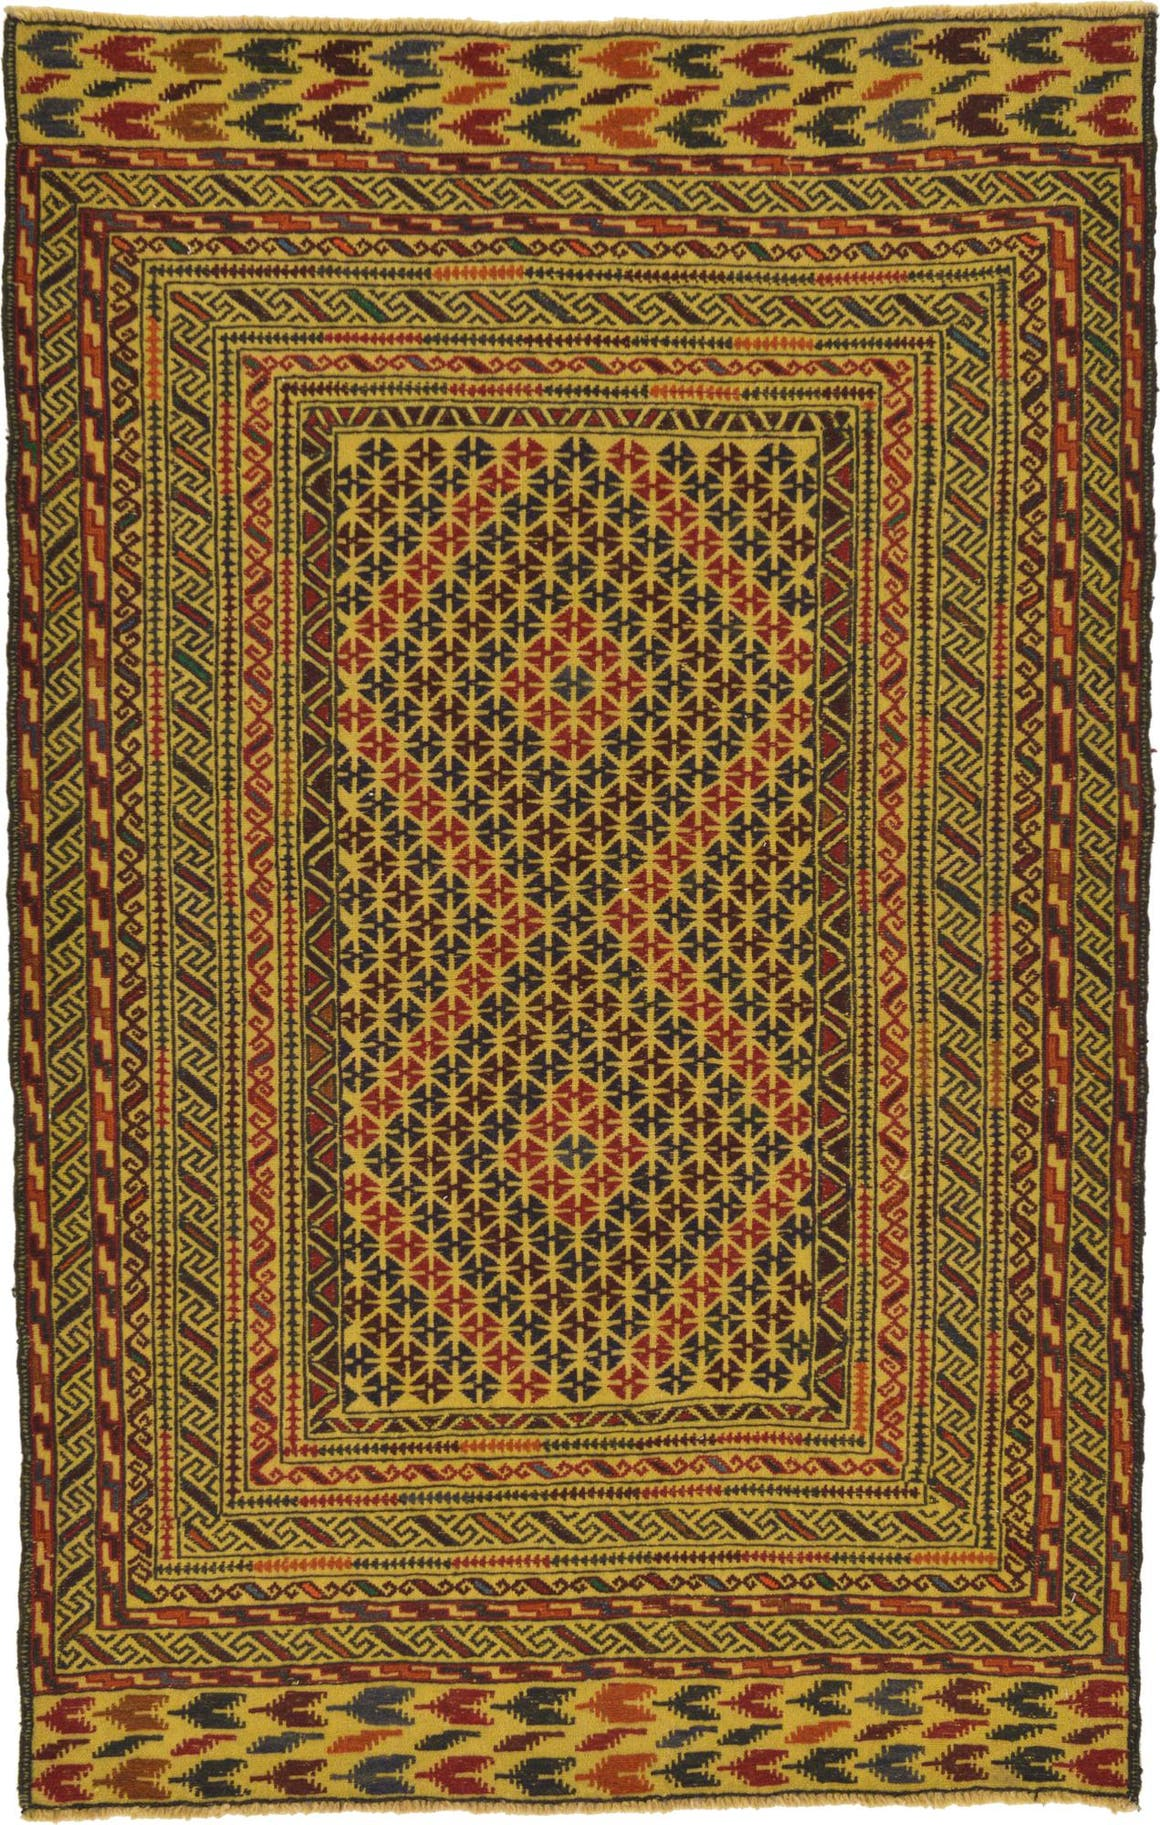 4' 4 x 6' 8 Kilim Afghan Rug main image